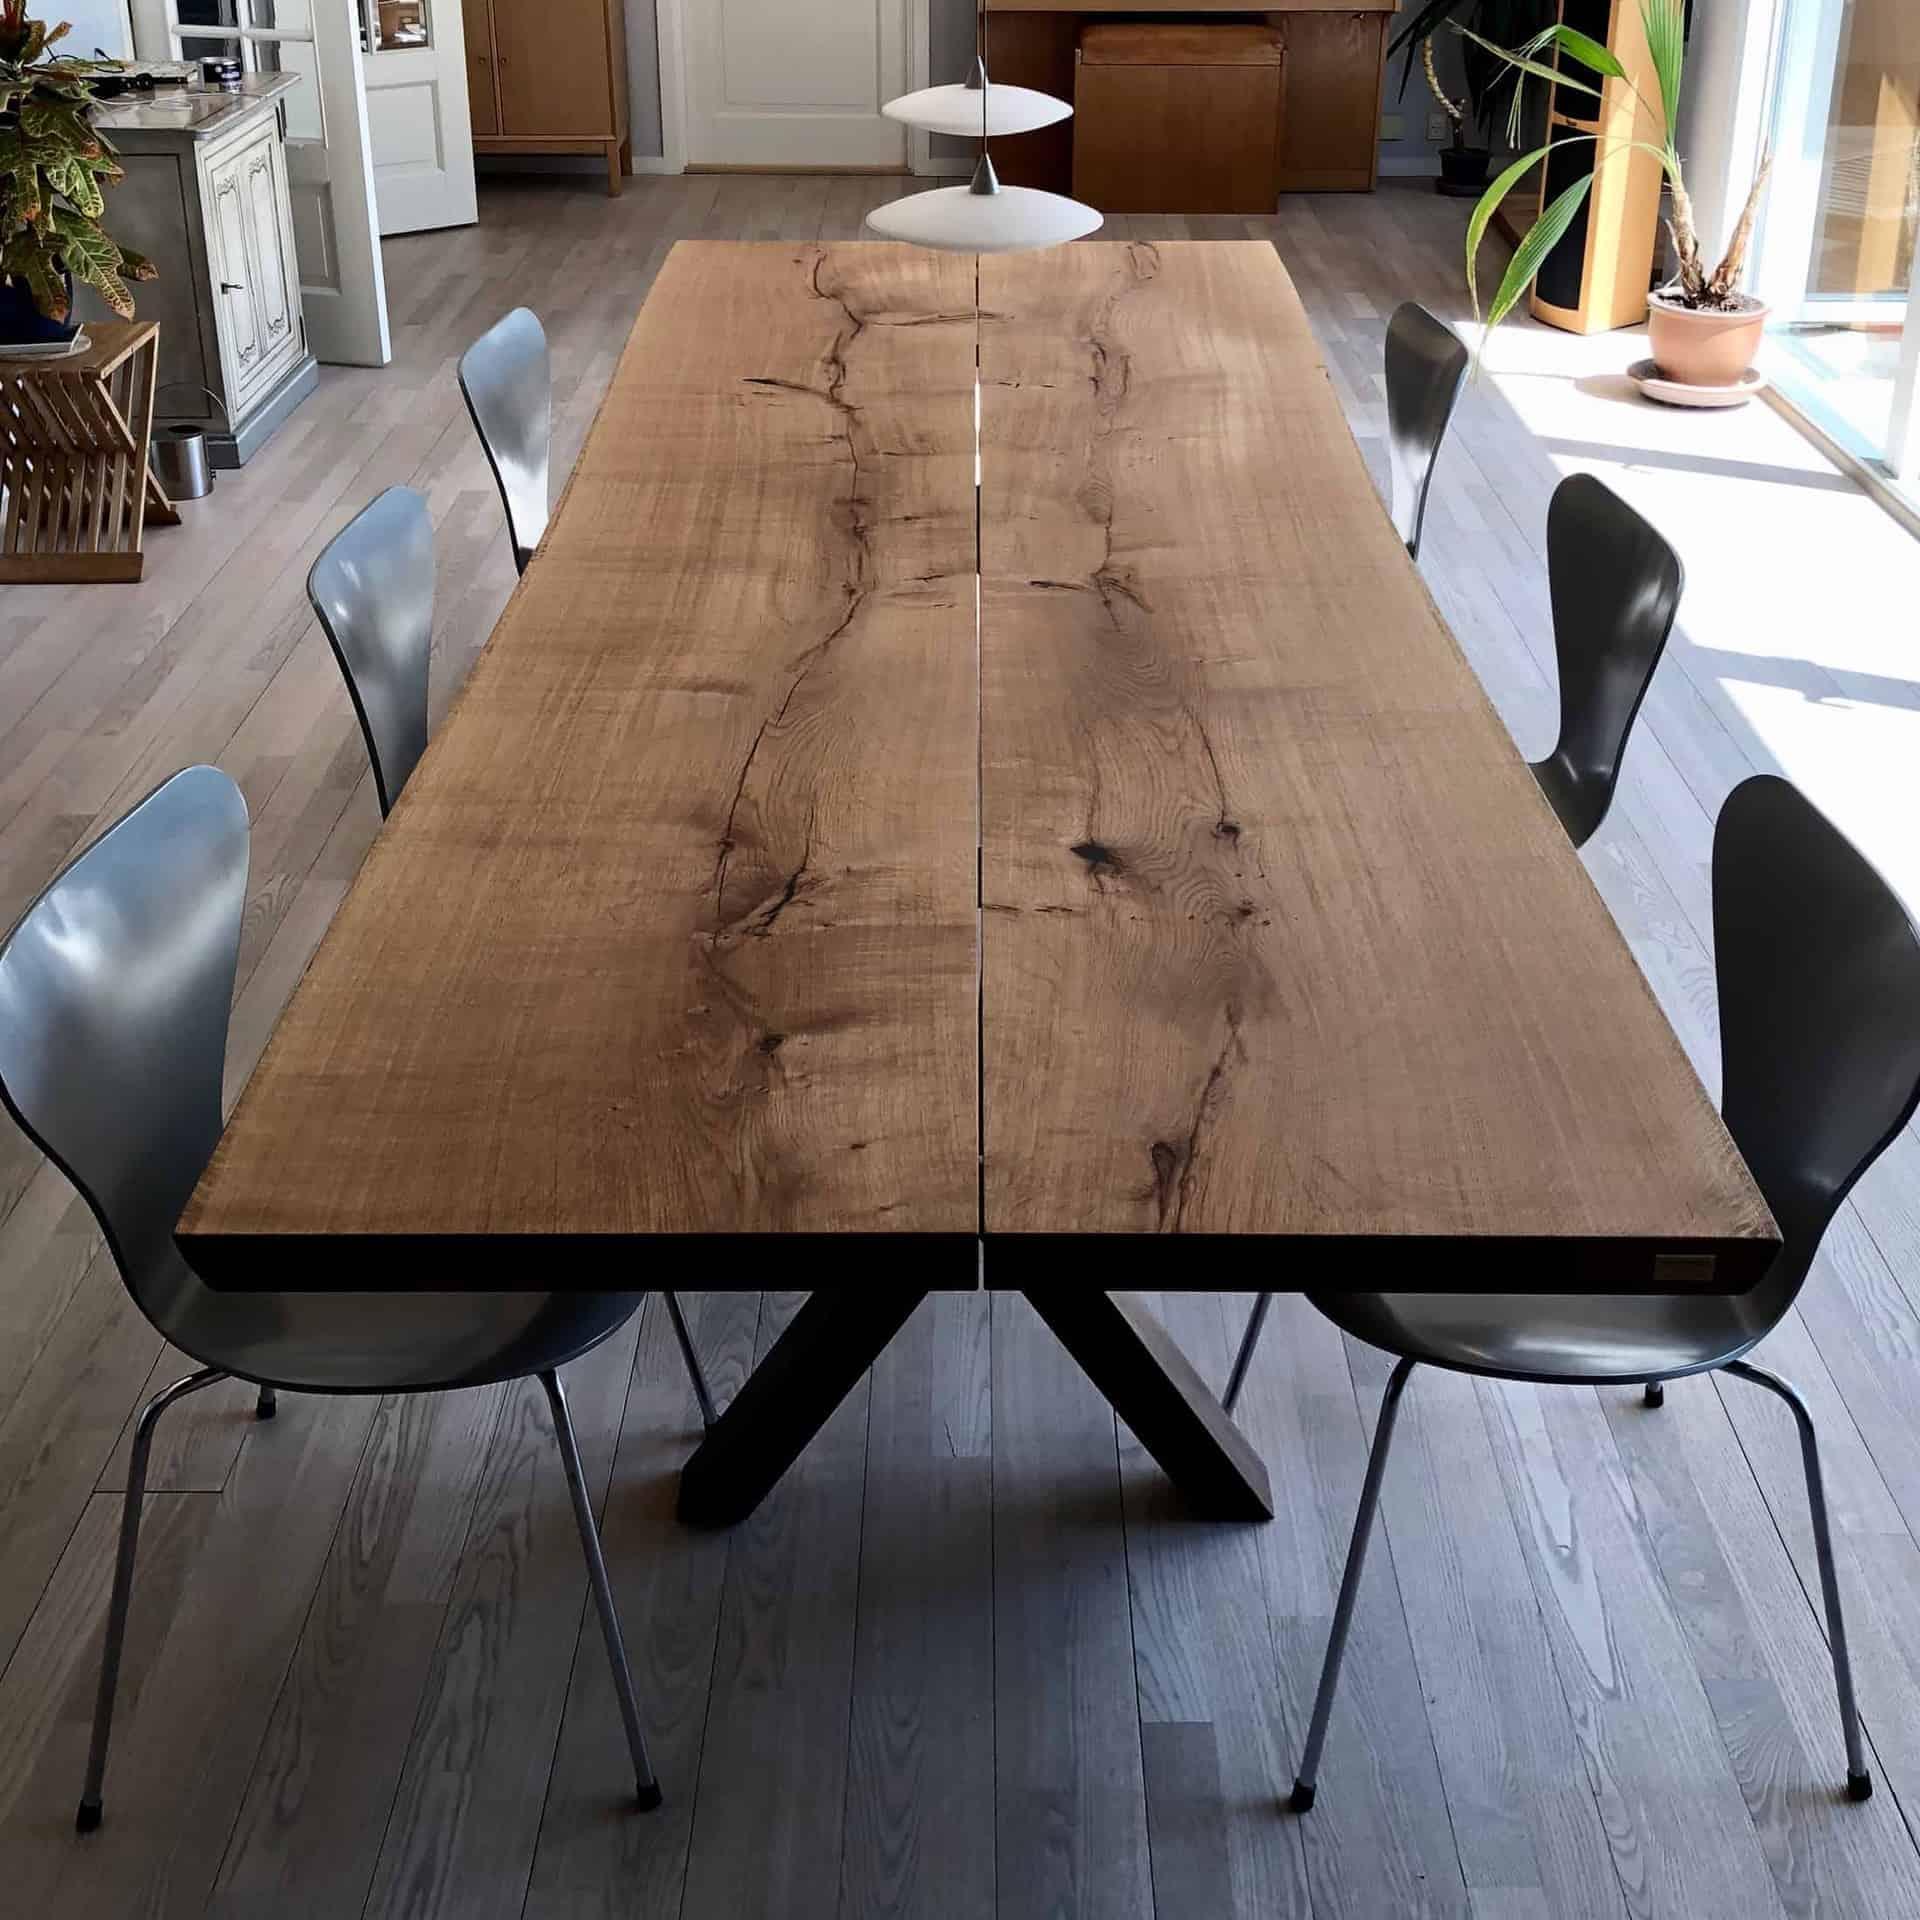 - kaerbygaard plankebord KÆRBYGÅRD 2020 snedkeri - træbord_ Egetræ - valnød elmetræ